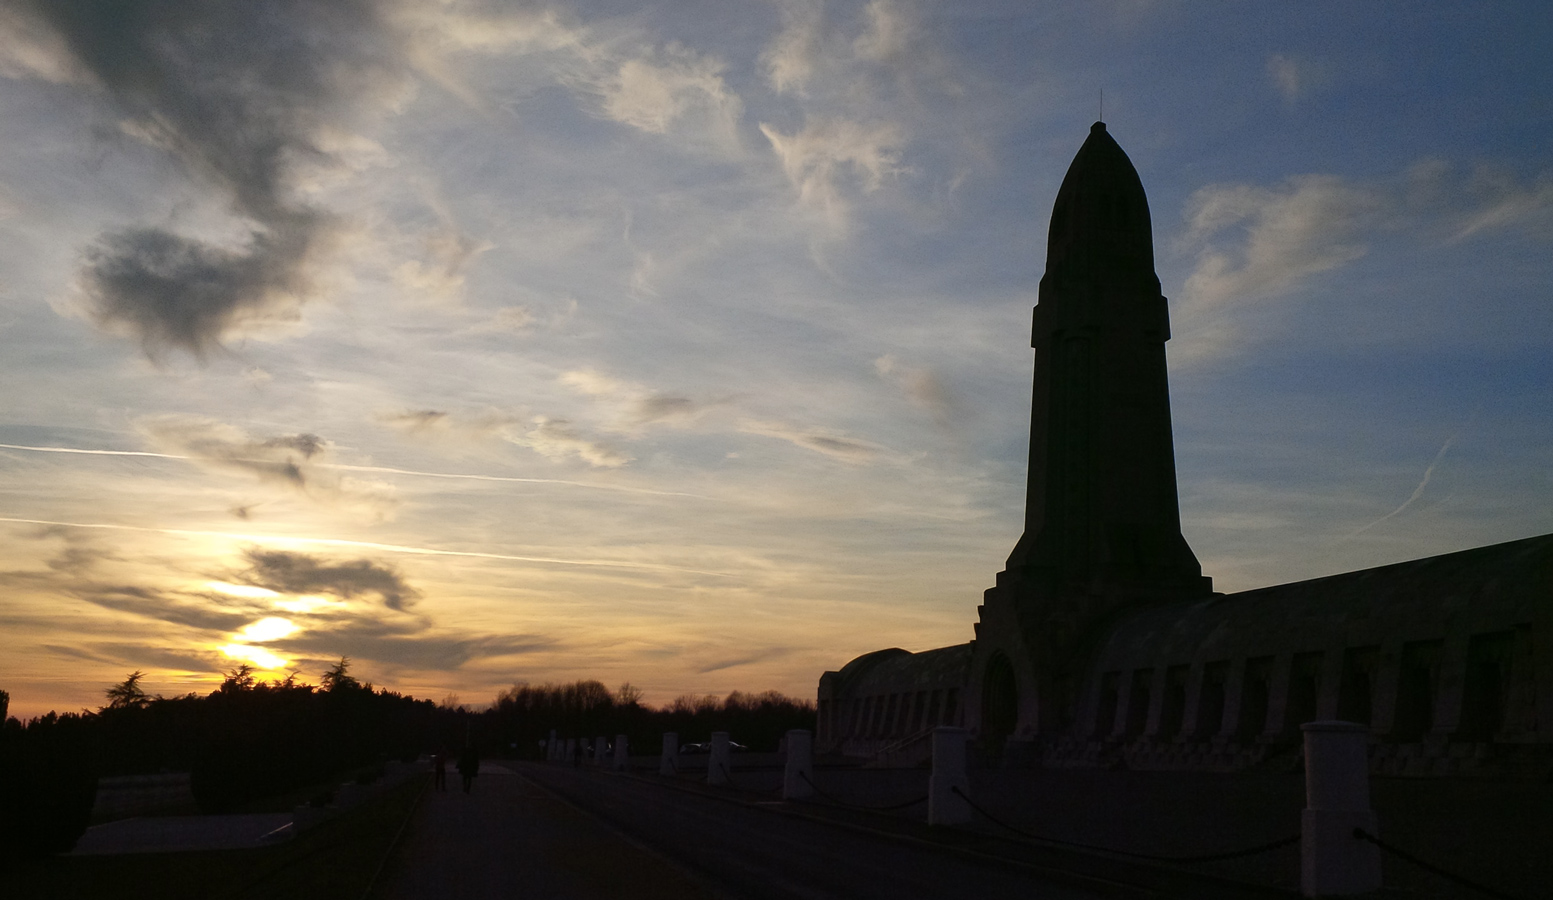 The Douaumont ossuary